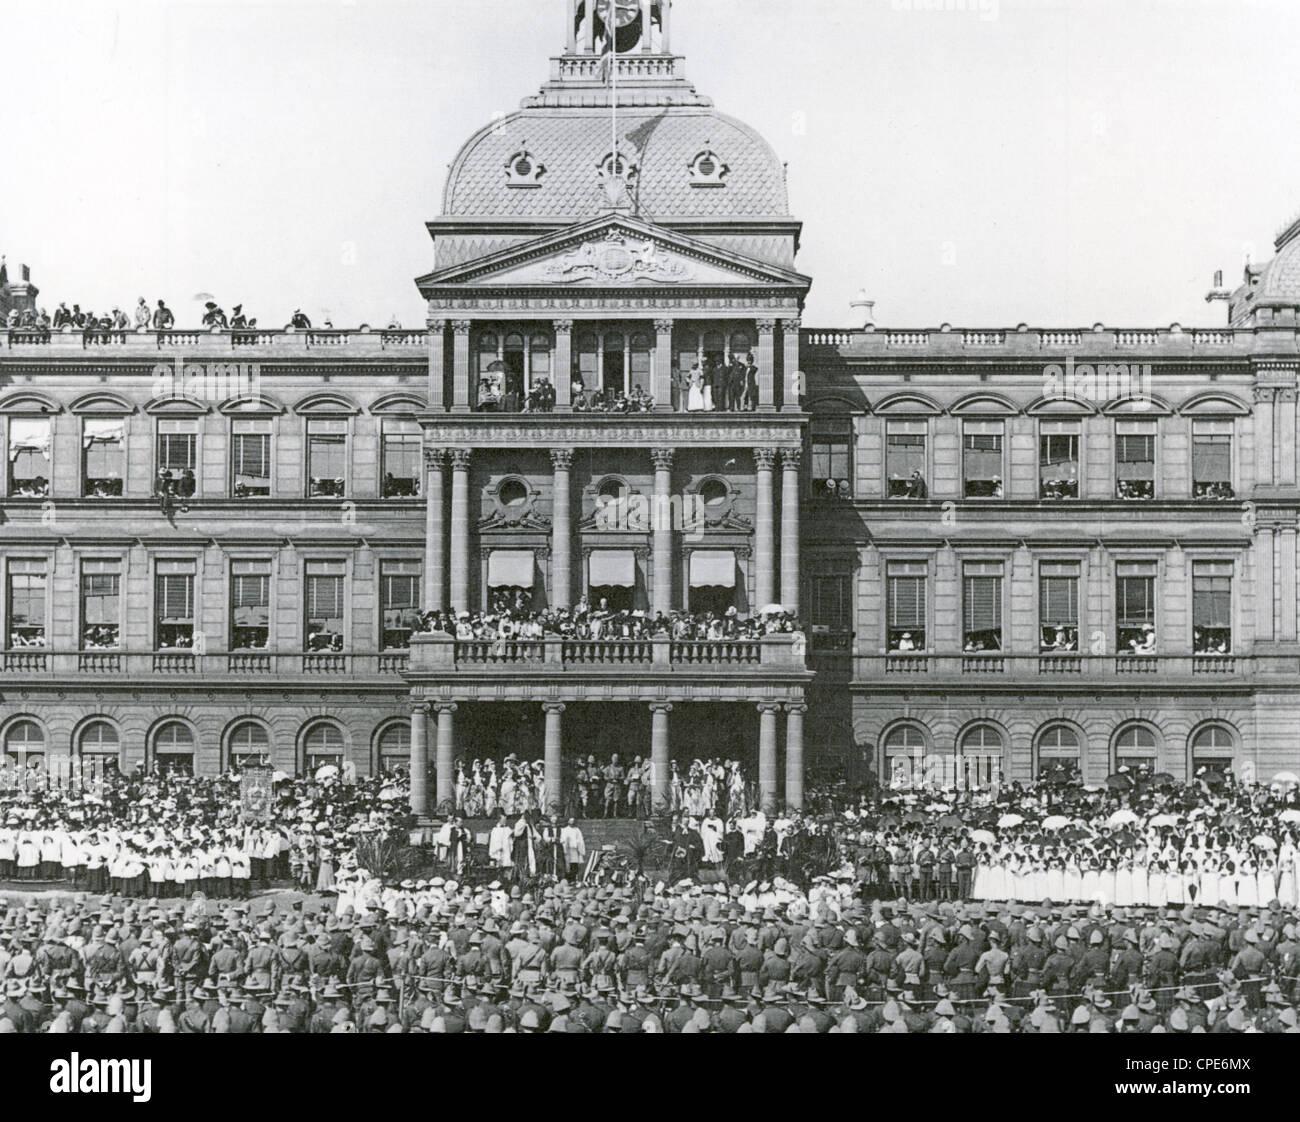 SECOND BOER WAR (1899-1902) Thanksgiving victory service in Pretoria, 8 June 1902 - Stock Image